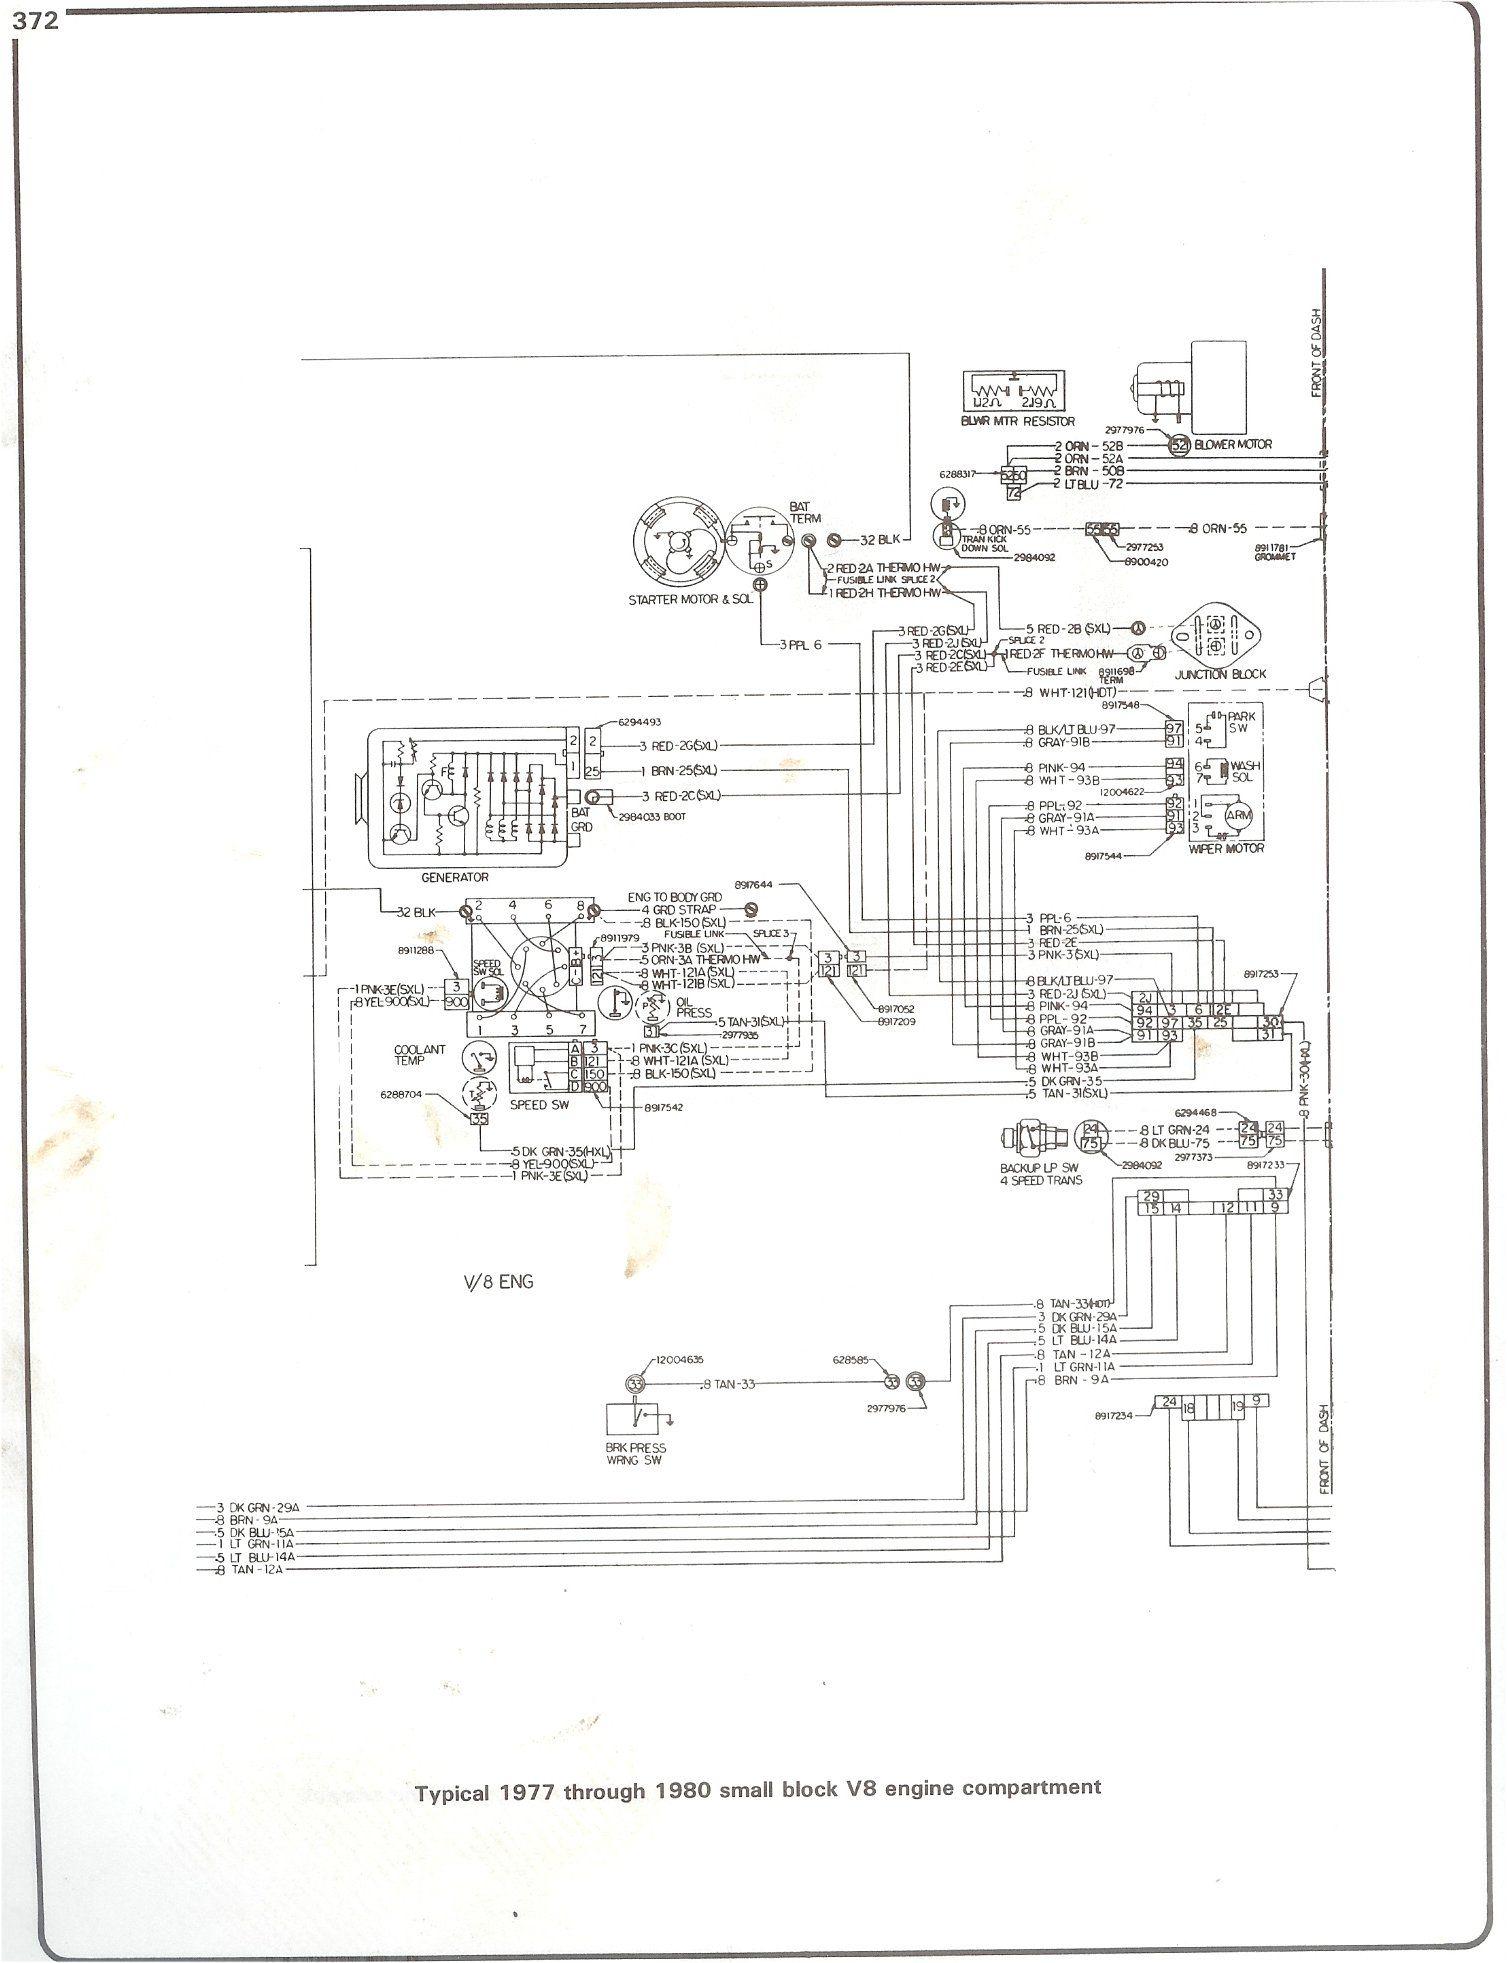 85 chevy c10 wiring diagram guitar 5 way switch truck